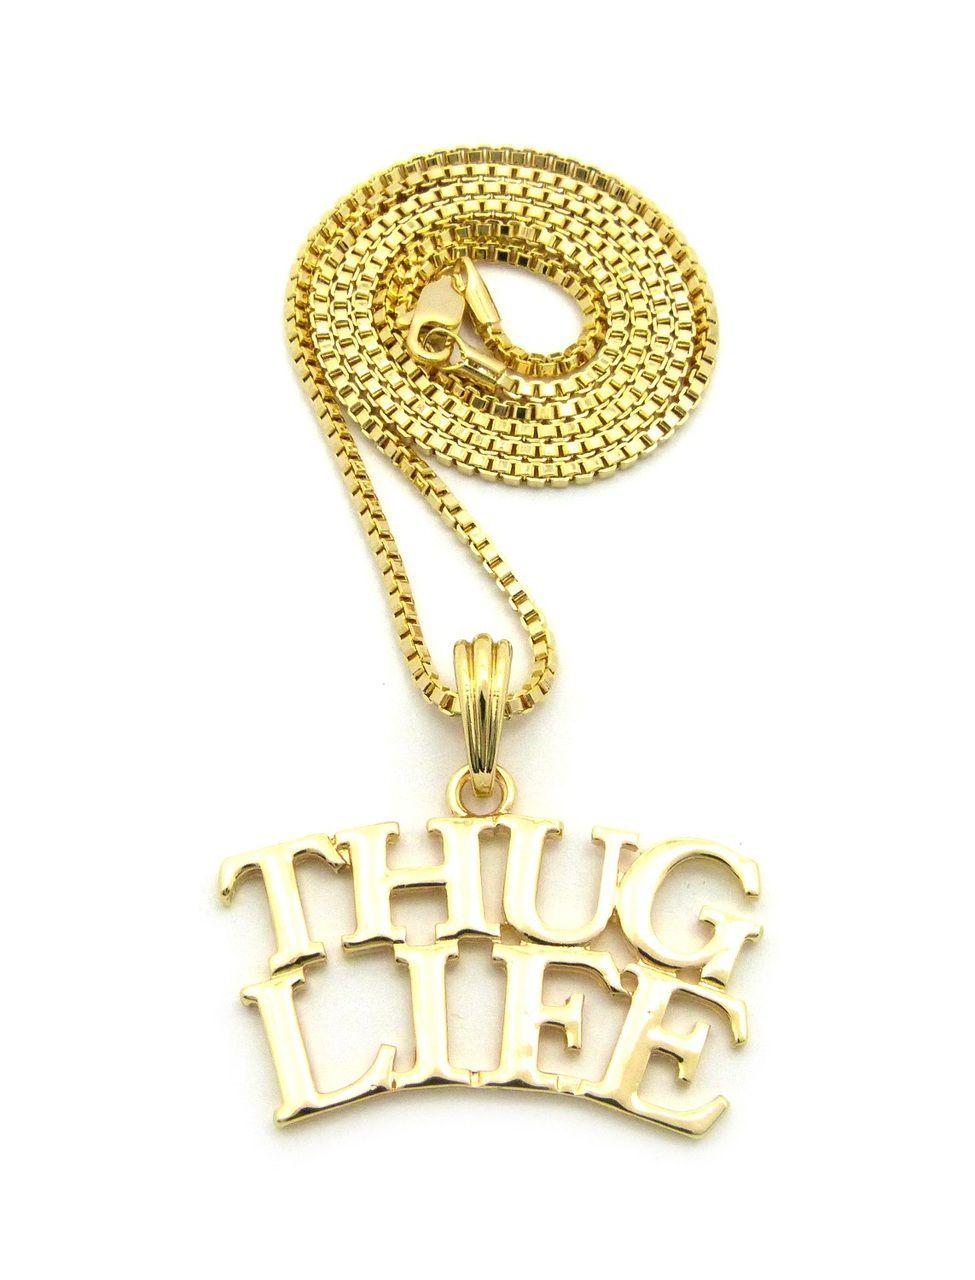 5b8d4596c7c270 Hip Hop Thug Life 14k Gold Pendant Chain - Bling Jewelz | Pendant ...